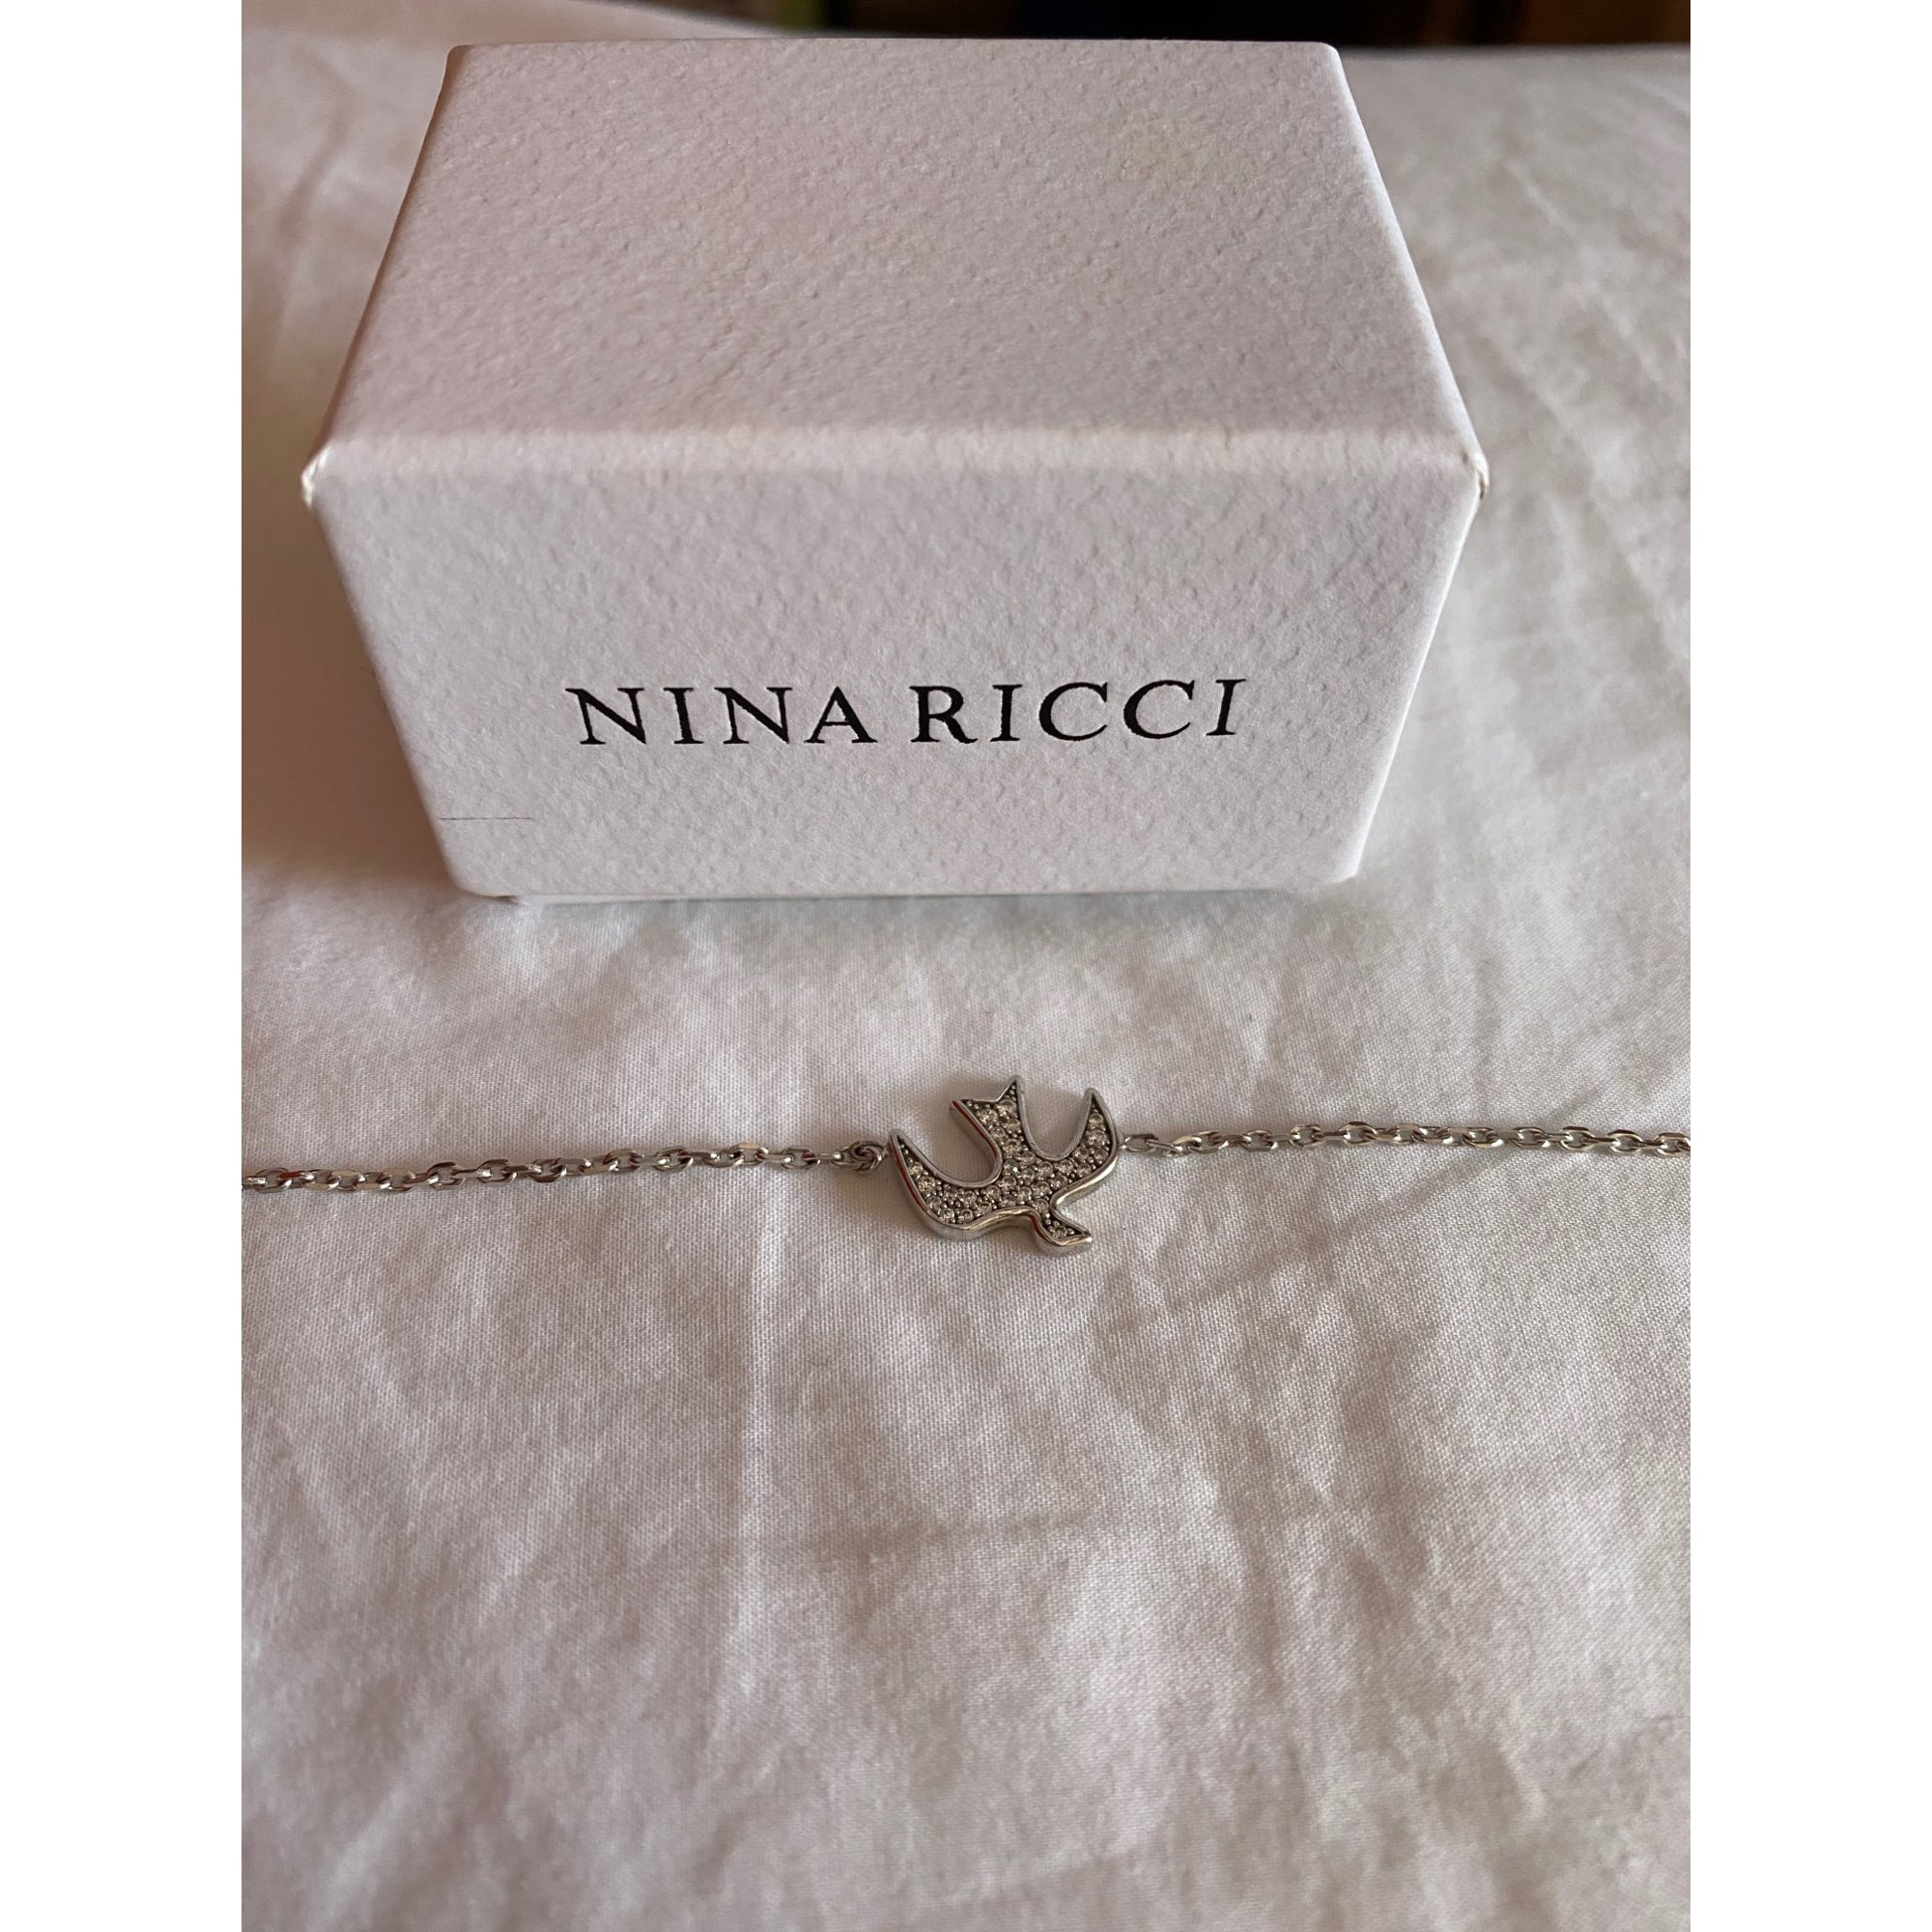 Bracelet NINA RICCI Argenté, acier